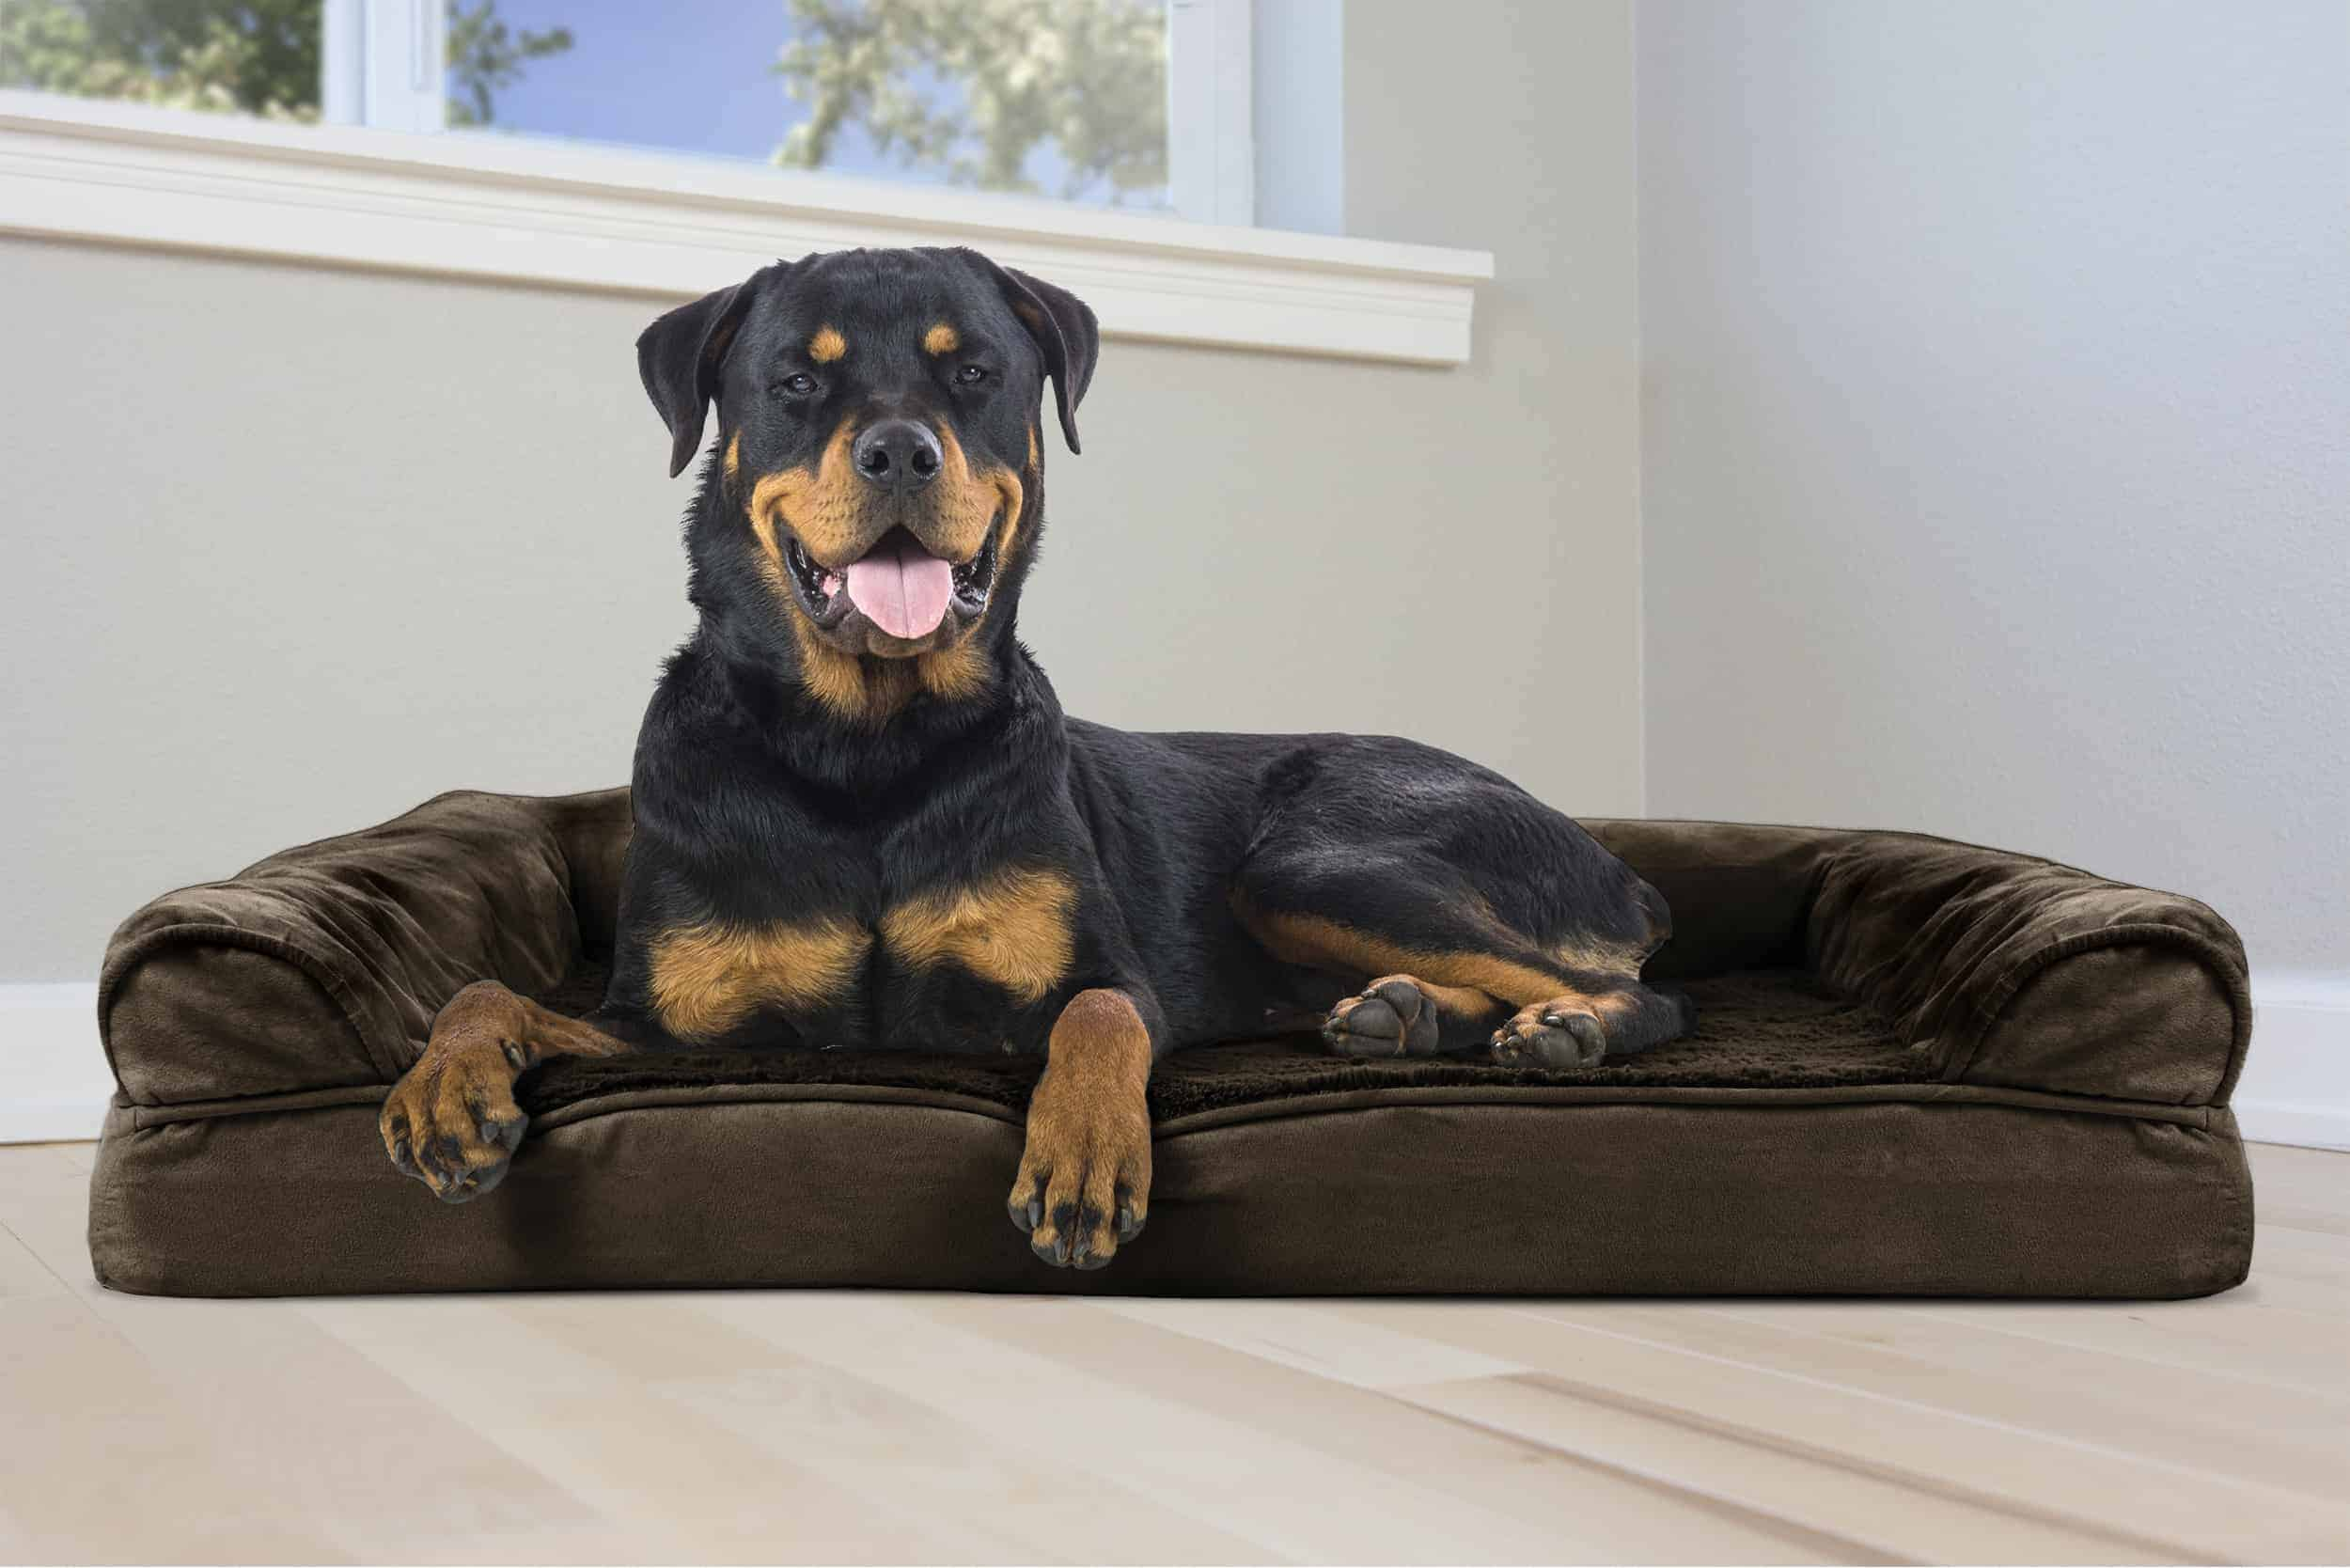 low-budget-orthopedic dog bed